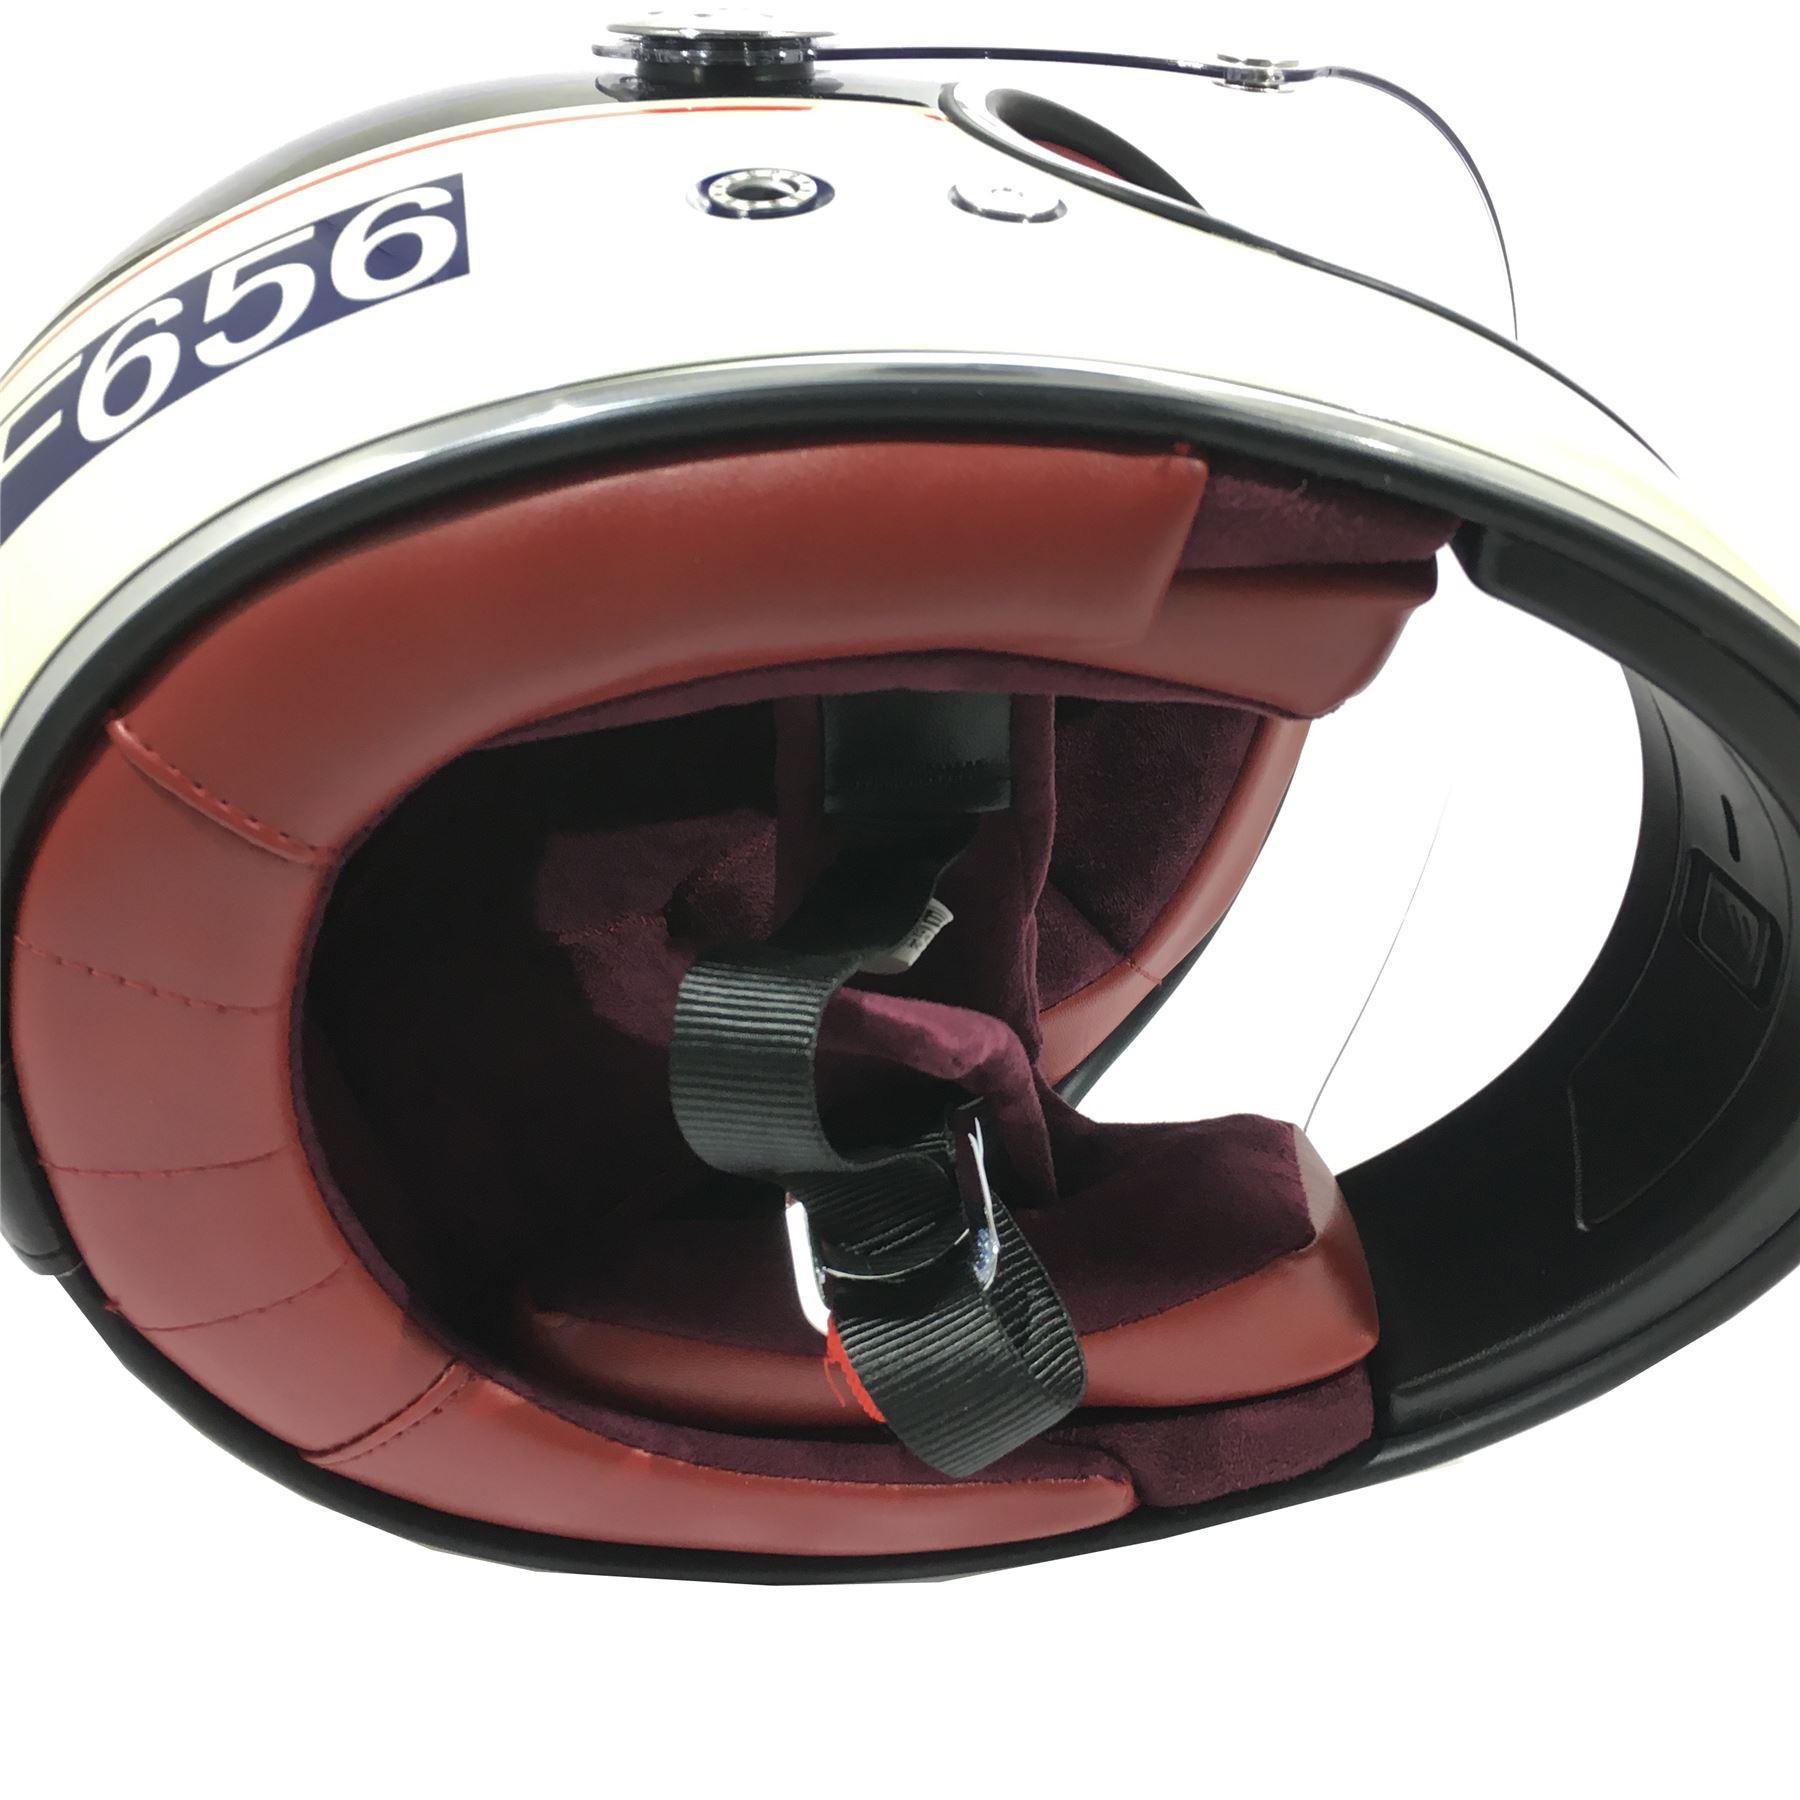 Viper-F656-Retro-Vintage-FibreGlass-Full-Face-Motorcycle-Bike-Road-Crash-Helmet miniature 21